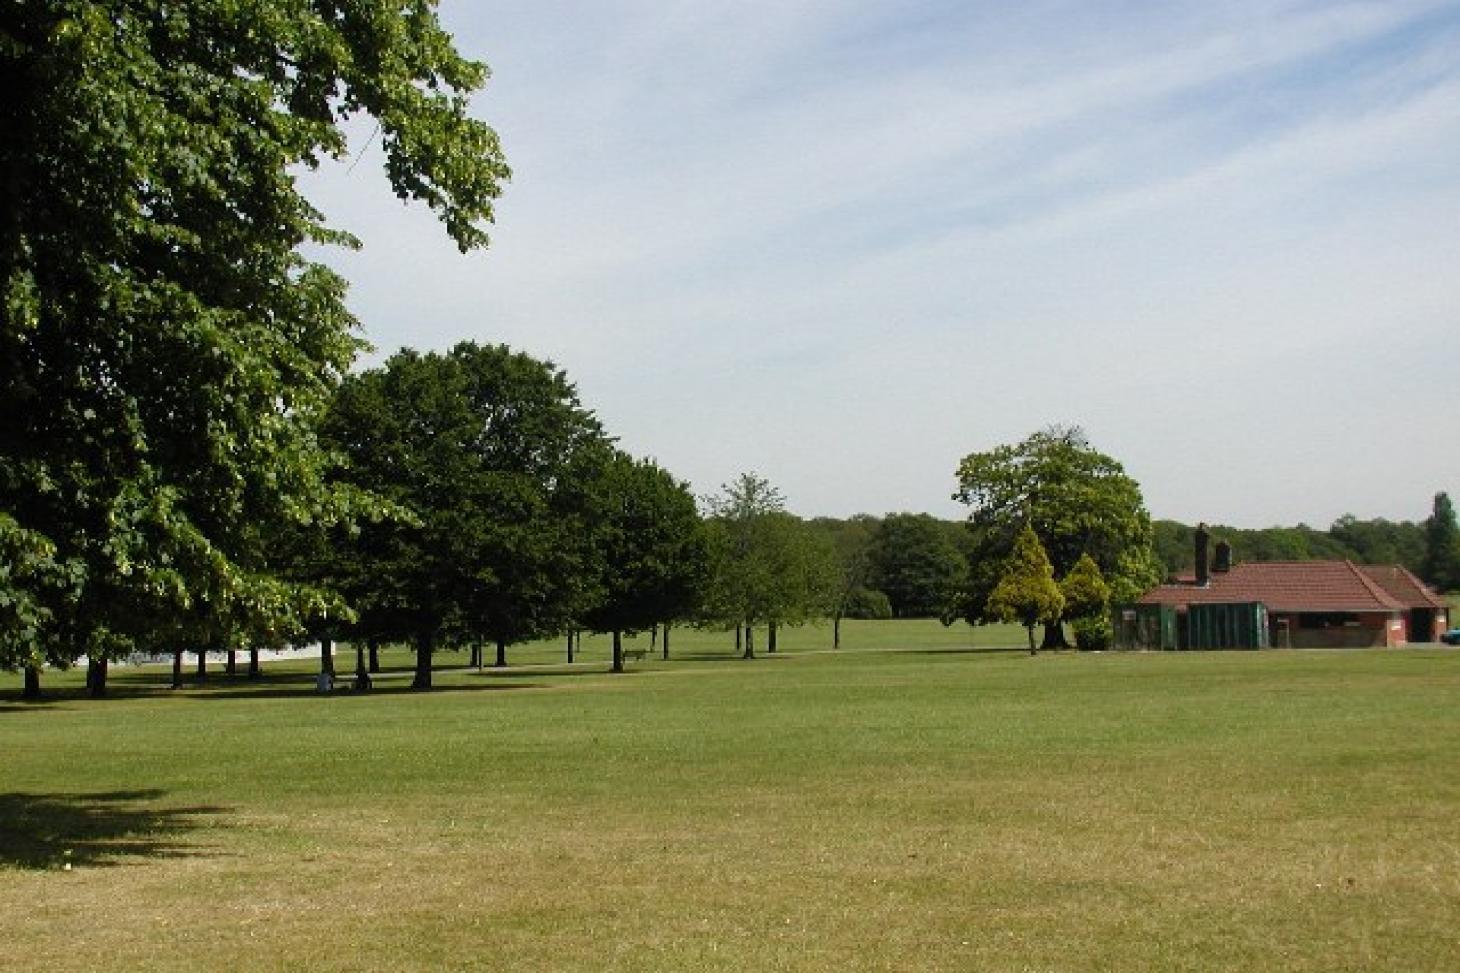 Eltham Park 5 a side | Grass football pitch